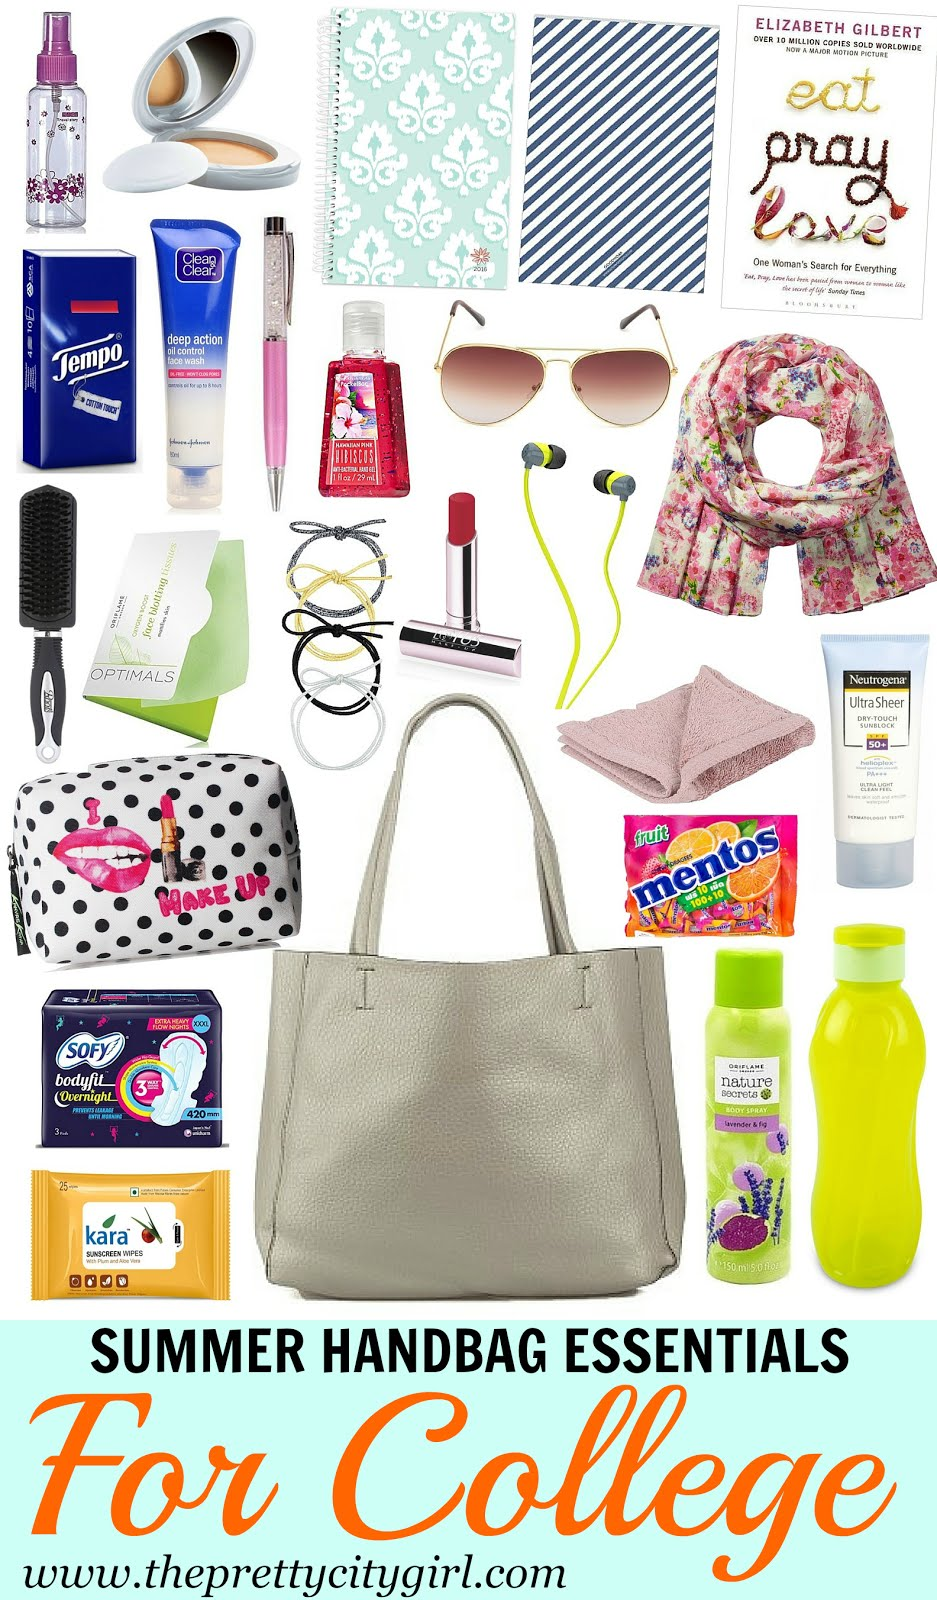 Summer Handbag Essentials For College